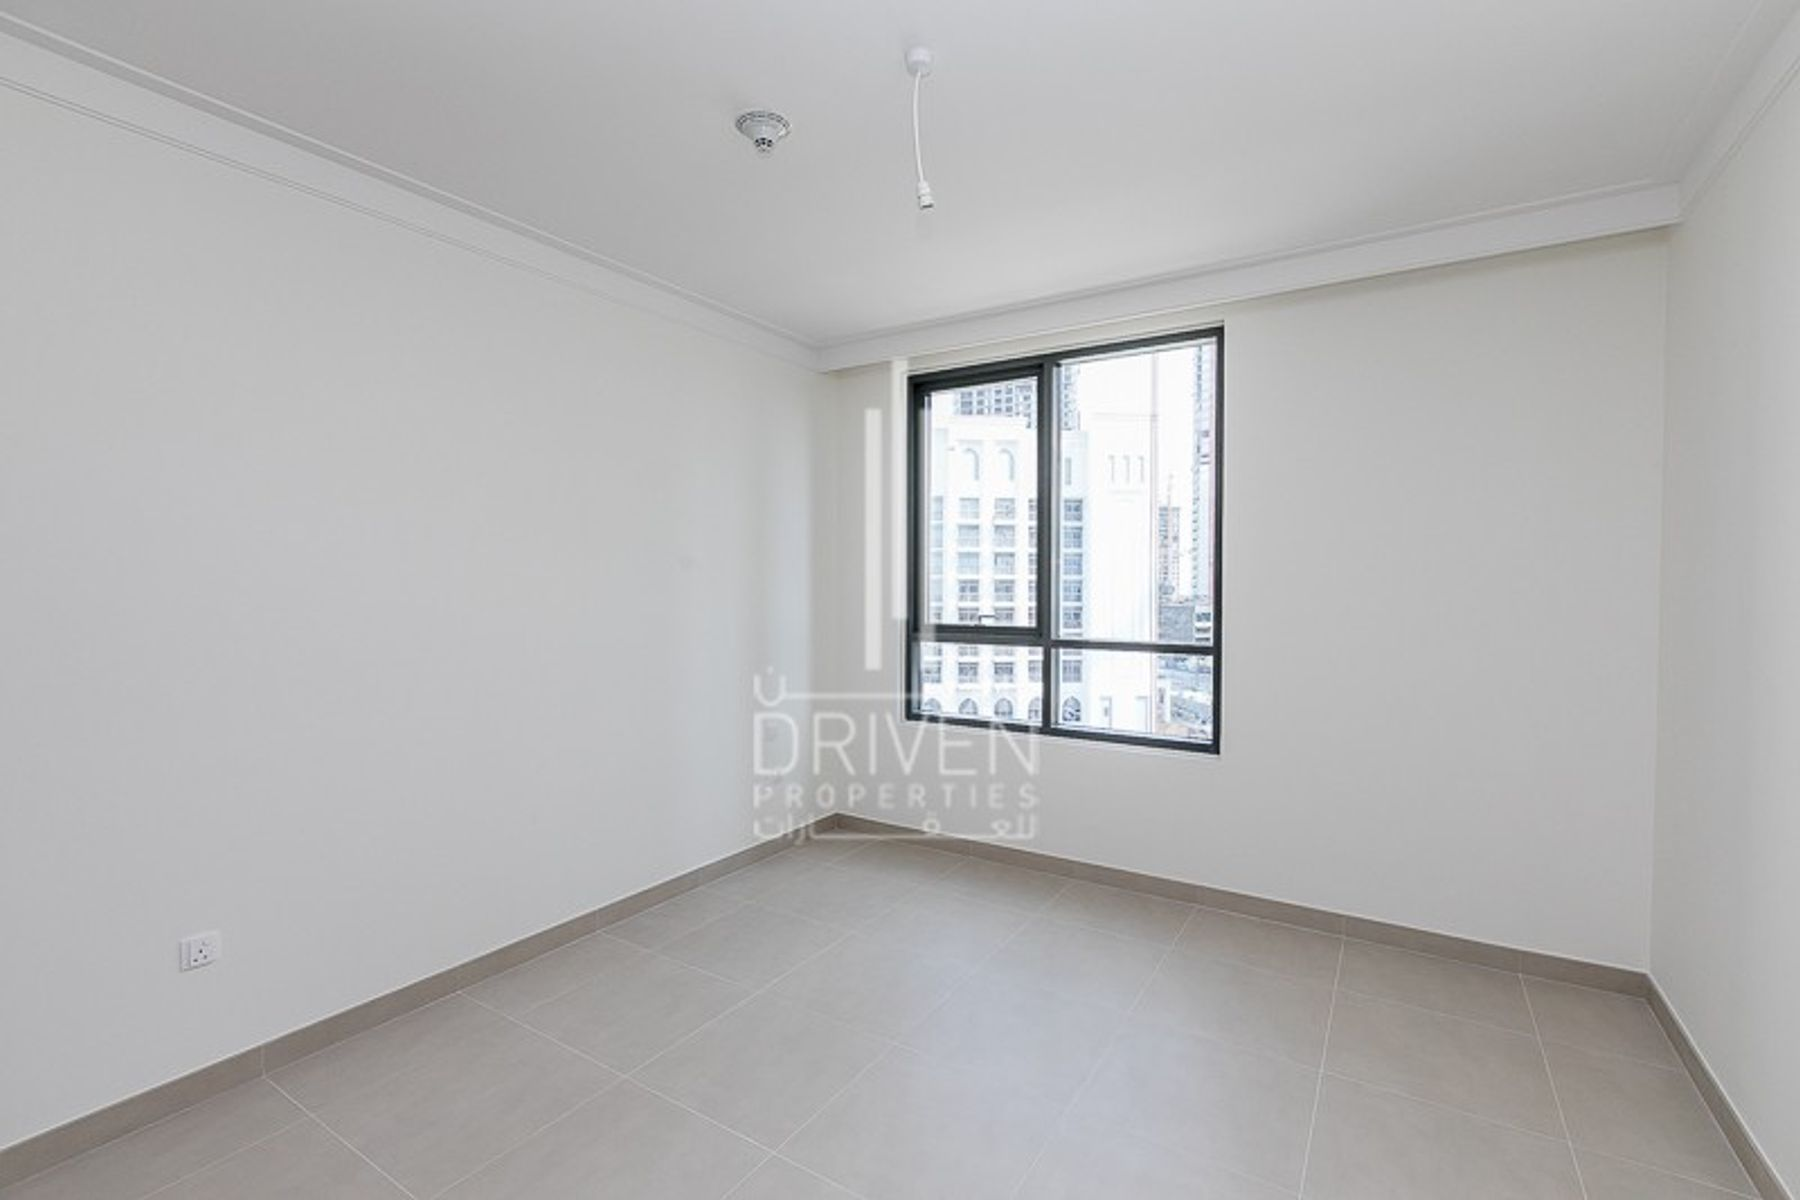 Apartment for Sale in Dubai Creek Residence Tower 1 North - Dubai Creek Harbour